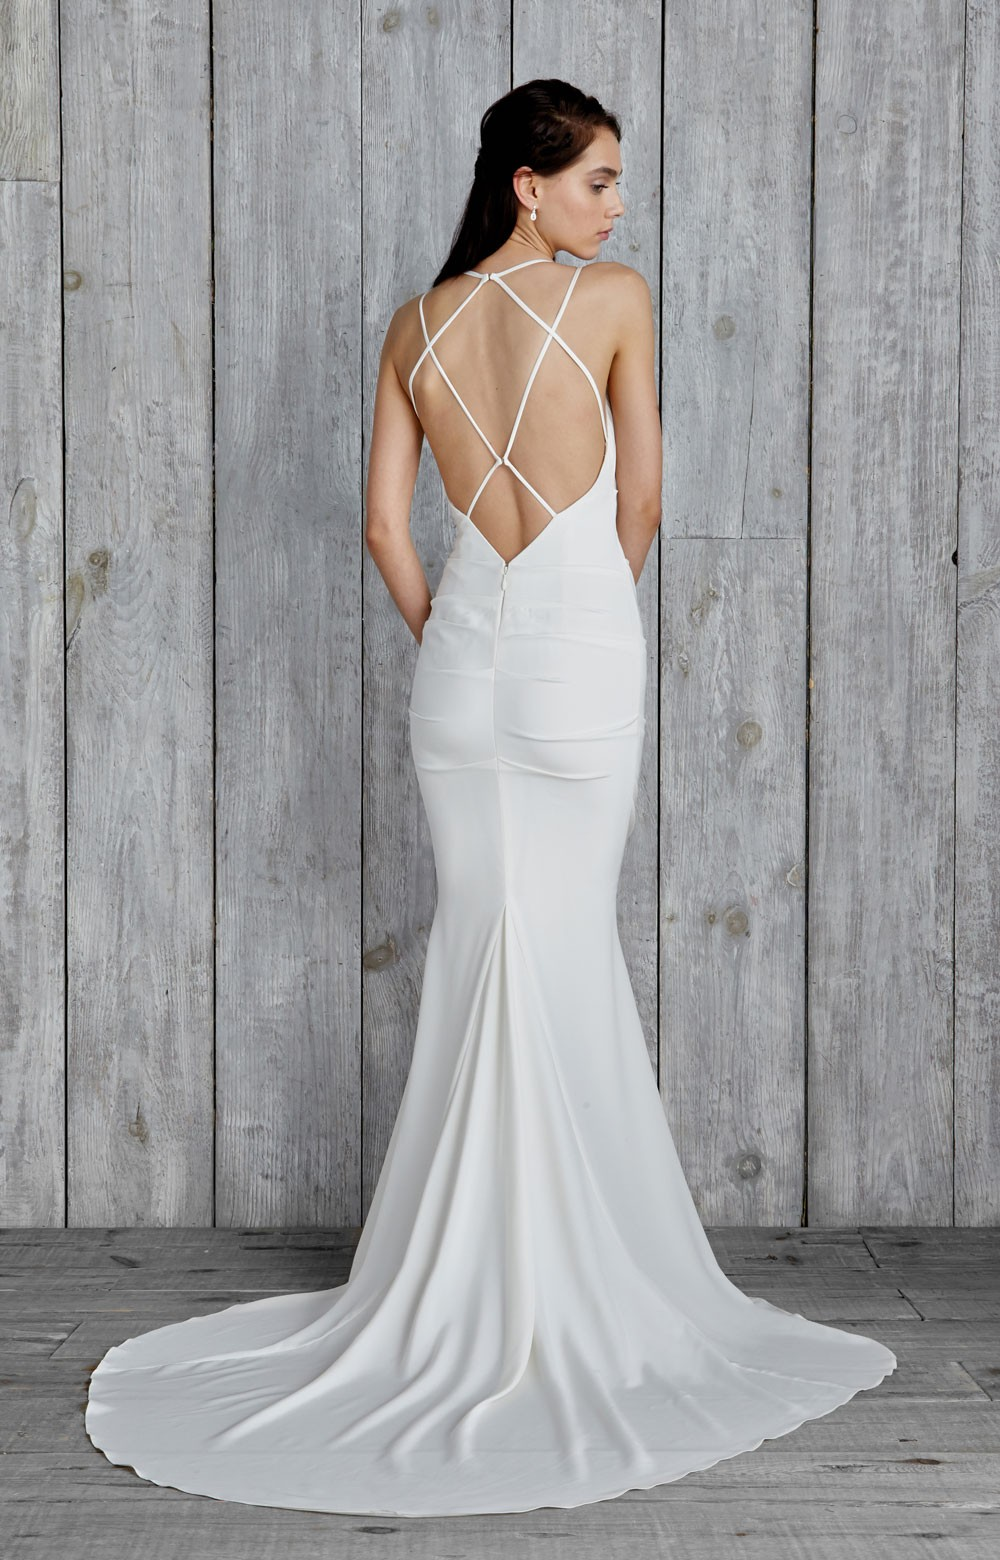 NICOLE MILLER BRIDAL CELINE | Bijou Bridal. Bridal shops in NJ, PA